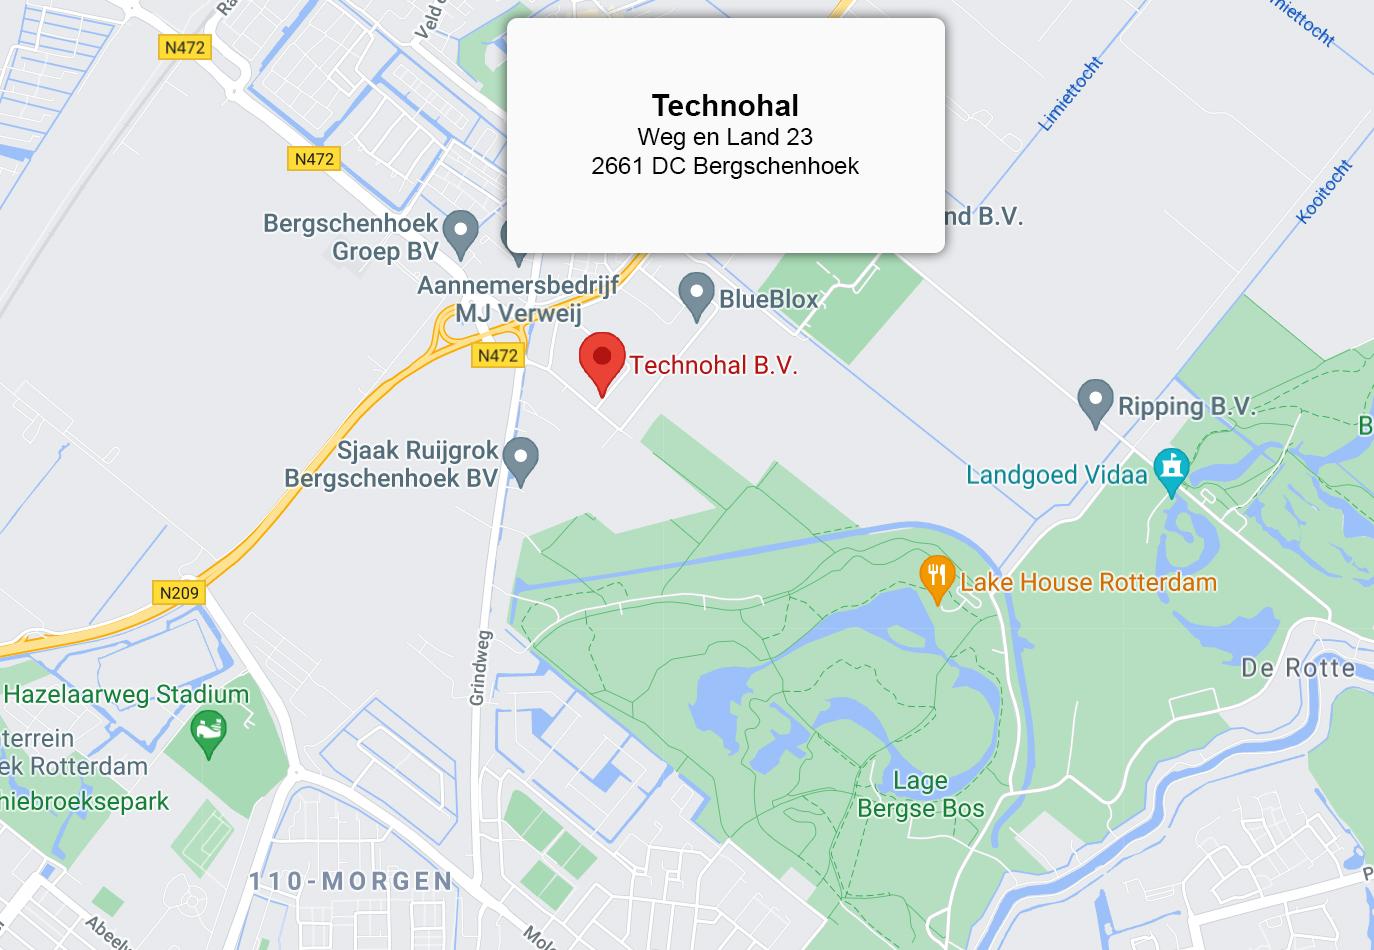 Adres Technohal